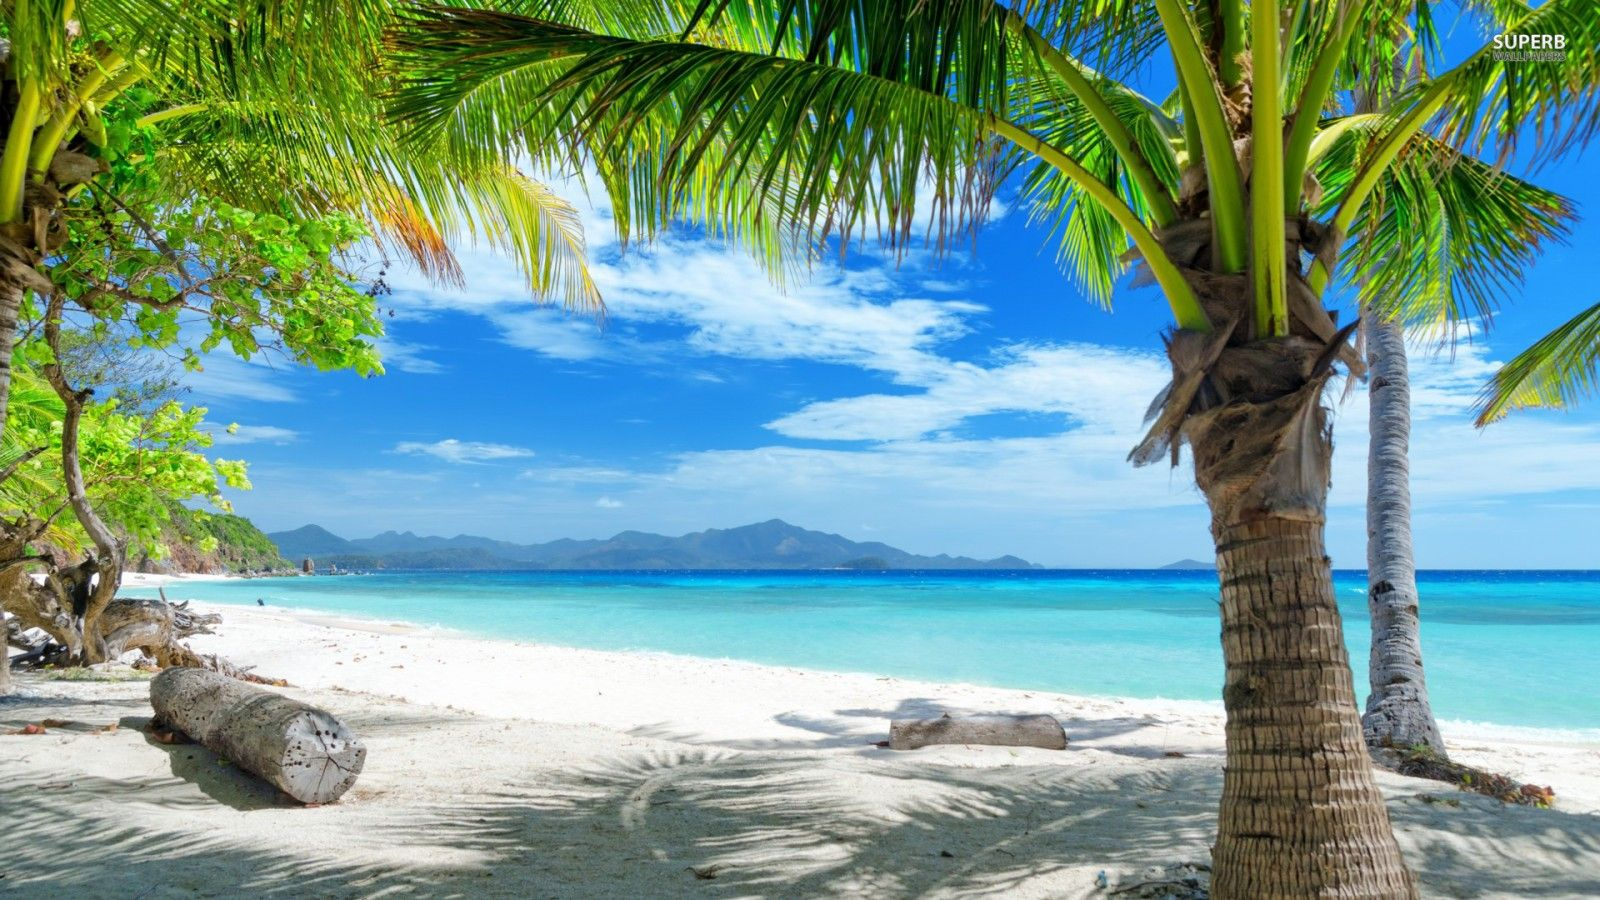 50 Tropical Scenes Wallpapers   Download at WallpaperBro 1600x900